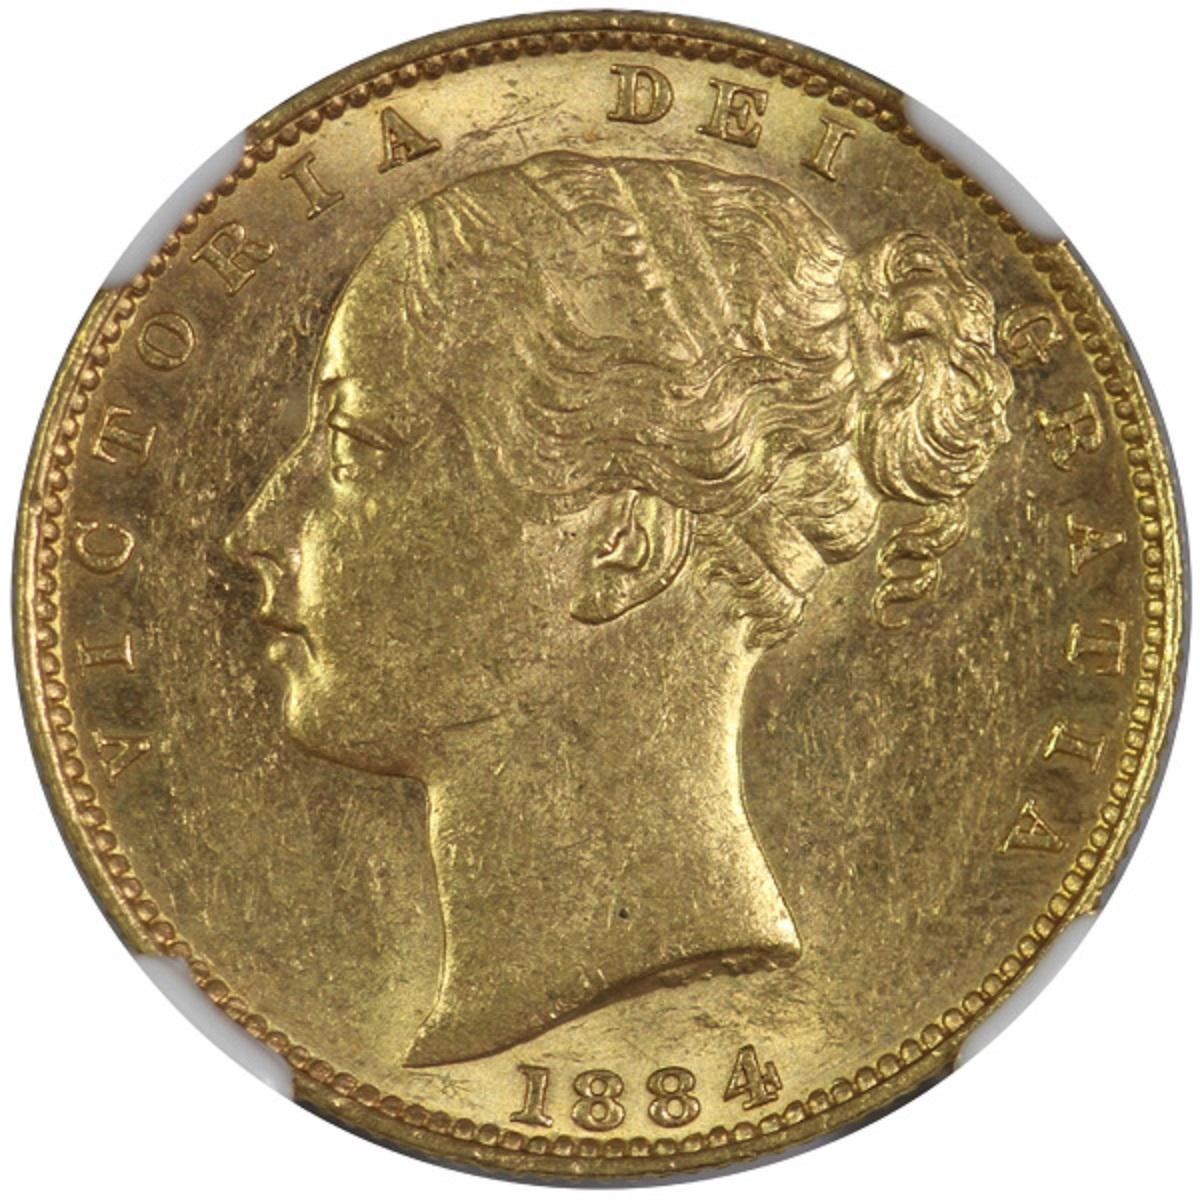 Australia. 1884 M 'Shield' Gold (0.916) Sovereign, NGC MS62